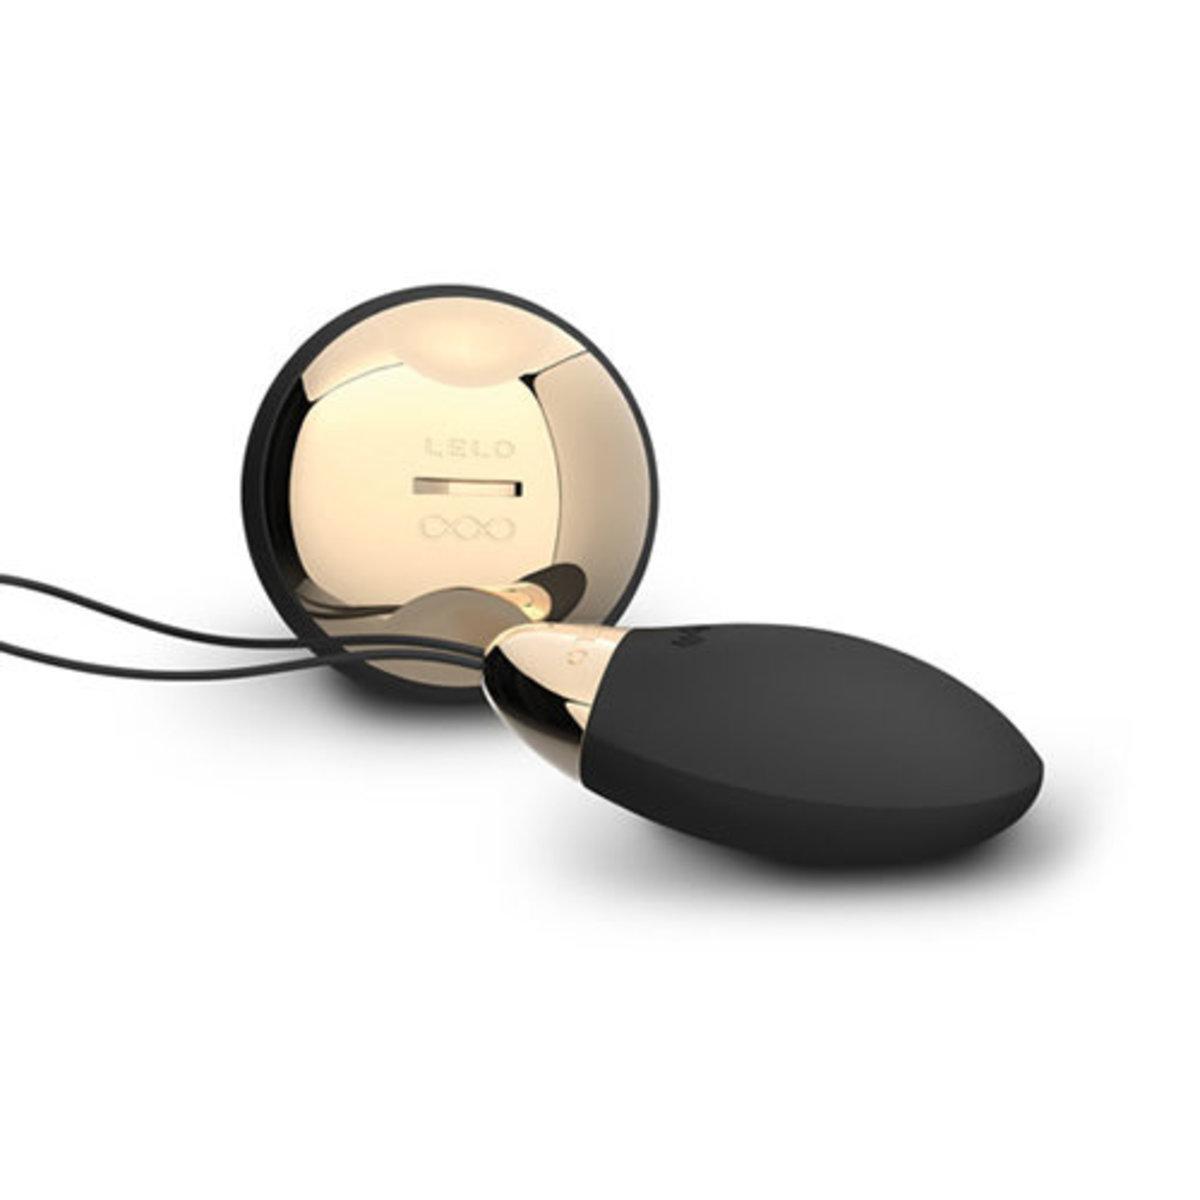 Lyla 2 Remote Controlled Love Egg - Black